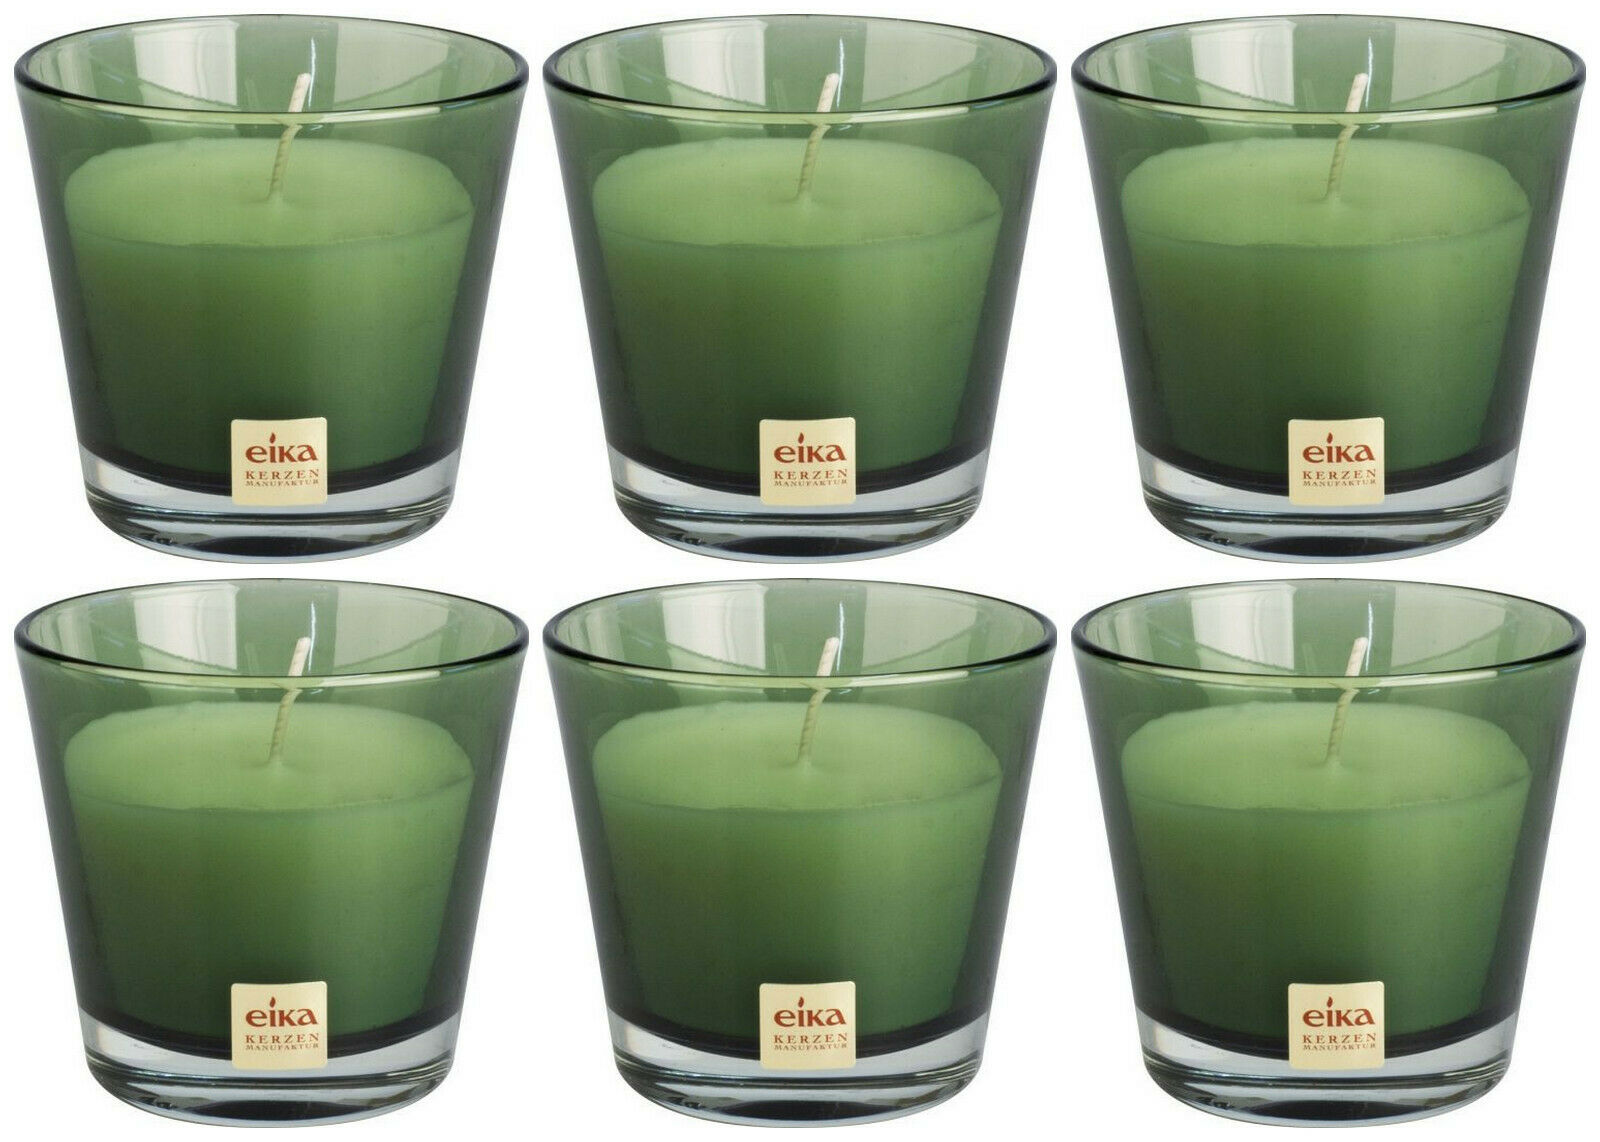 6 Stück Eika Kerzenglas 90x82 mm LARA Kerzen im Glas Candle Wachs Windlichtkerze - Kiwi-grün